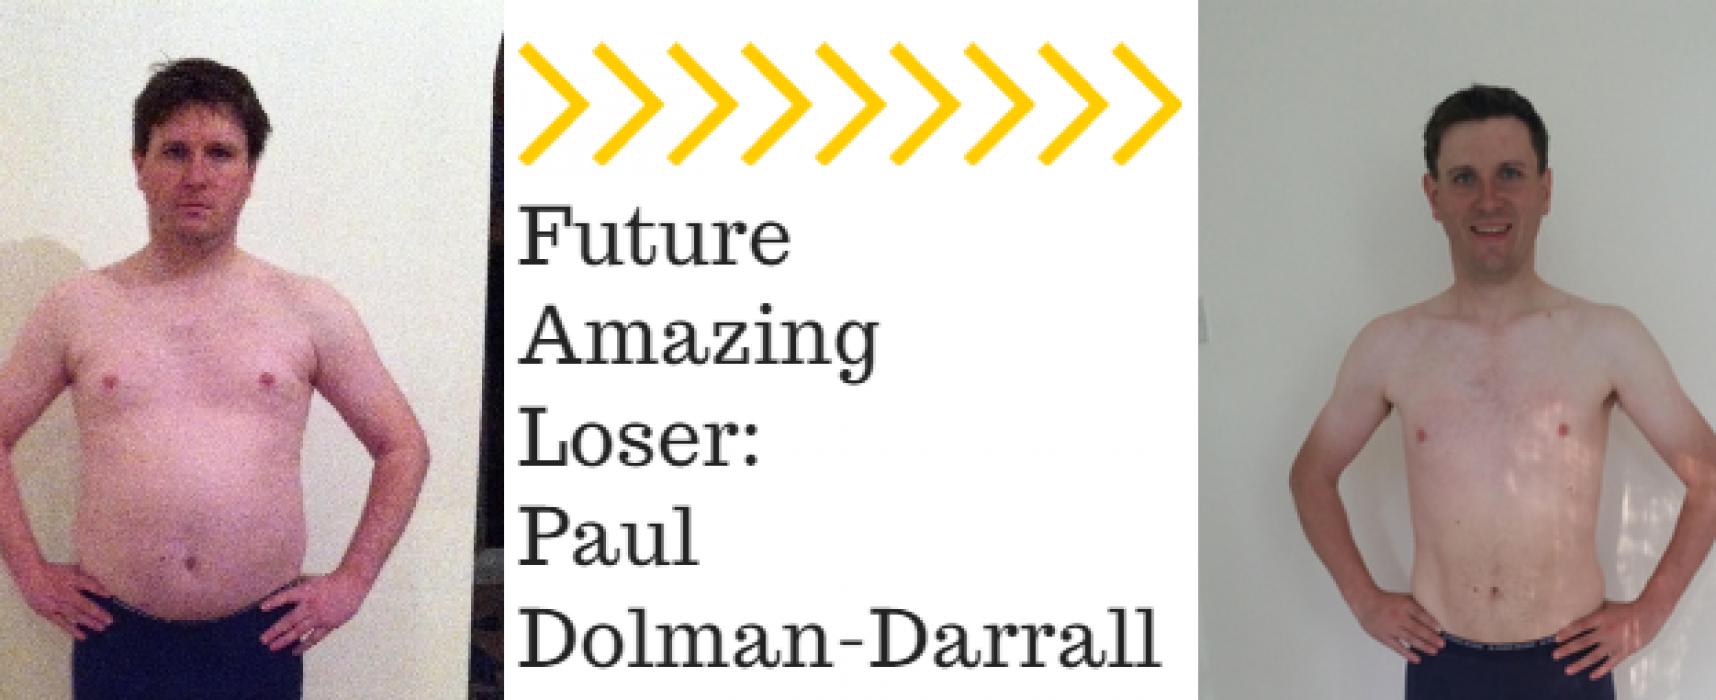 Future Amazing Losers – Paul Dolman-Darrall